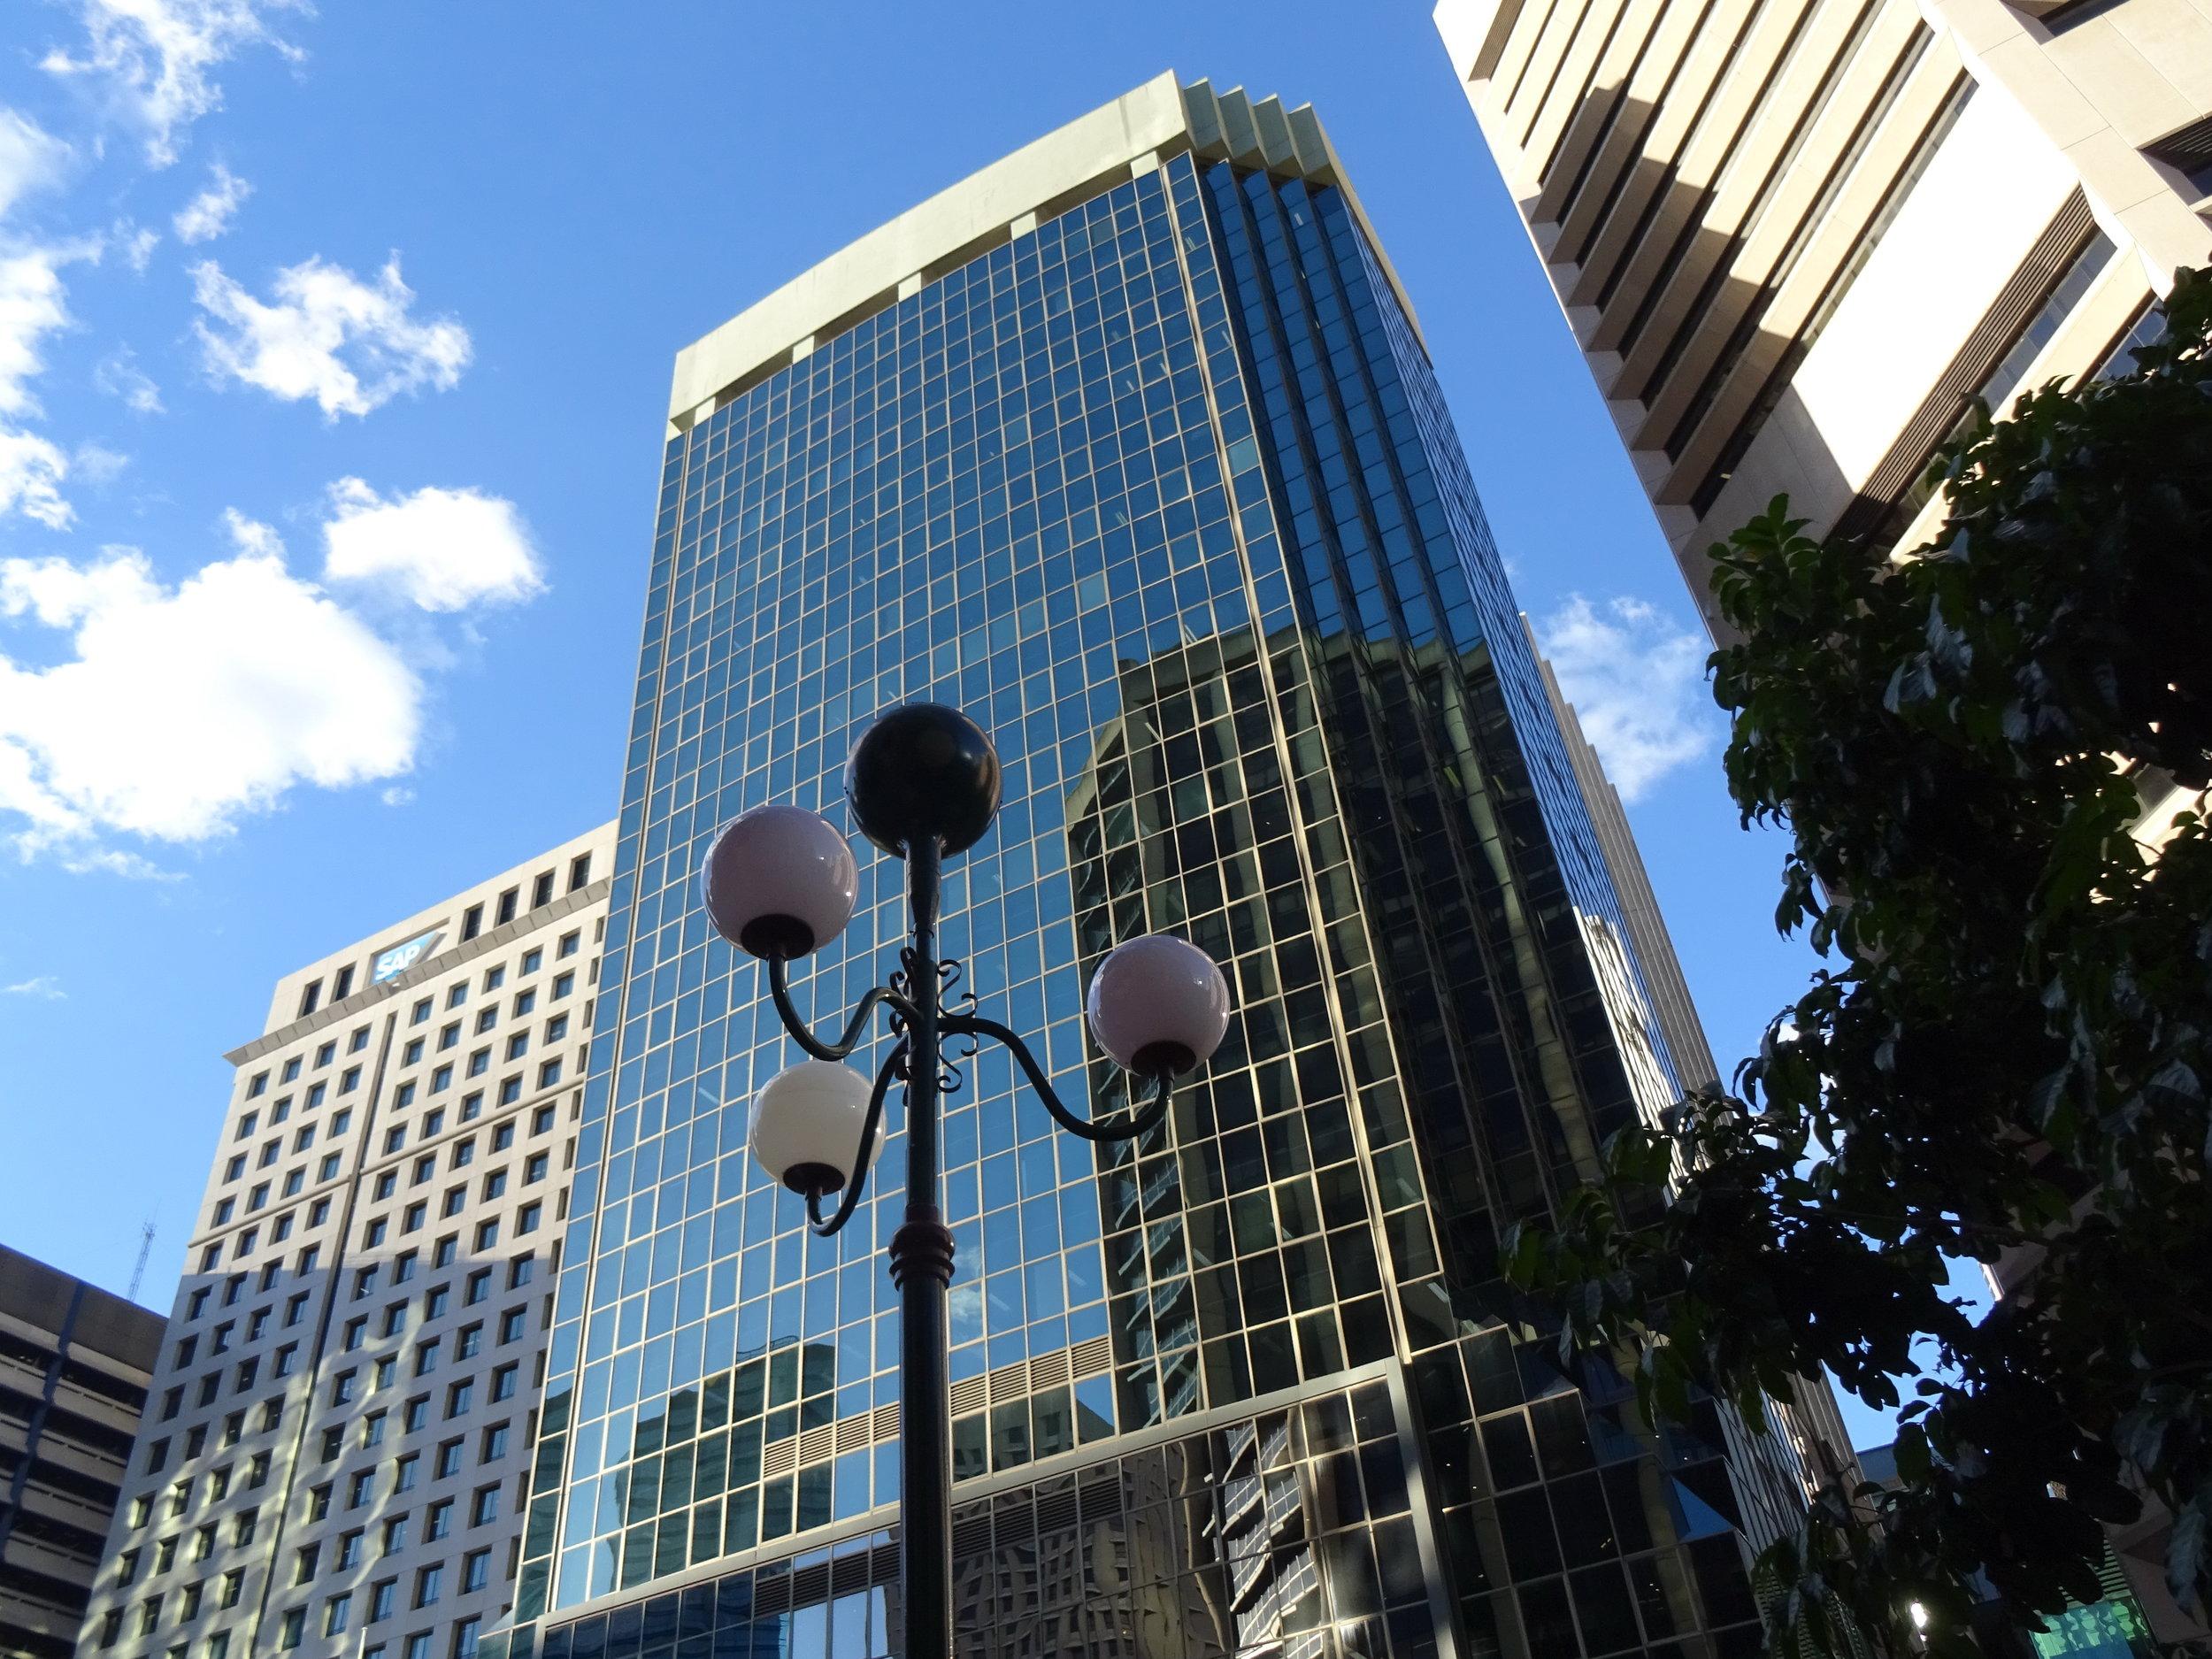 Brisbane DSC00931 Qld.JPG